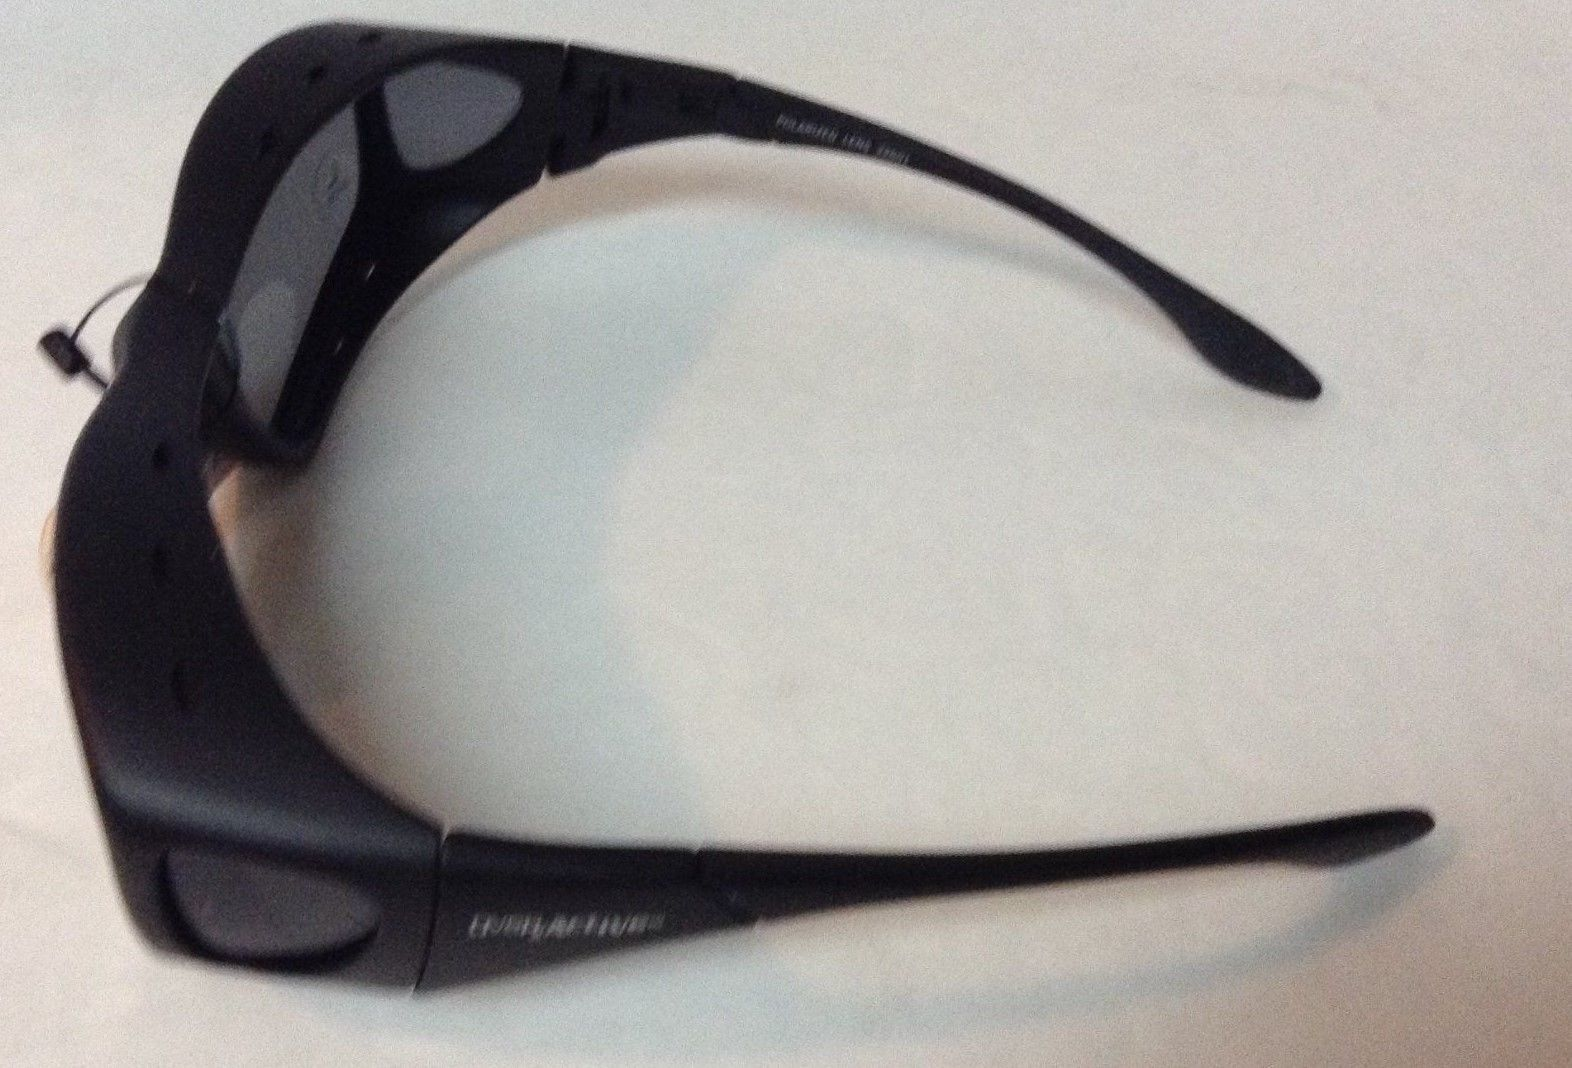 Black Sport Shield Sunglasses Sz Large NWT Overactive Sports Polarized 100% UV